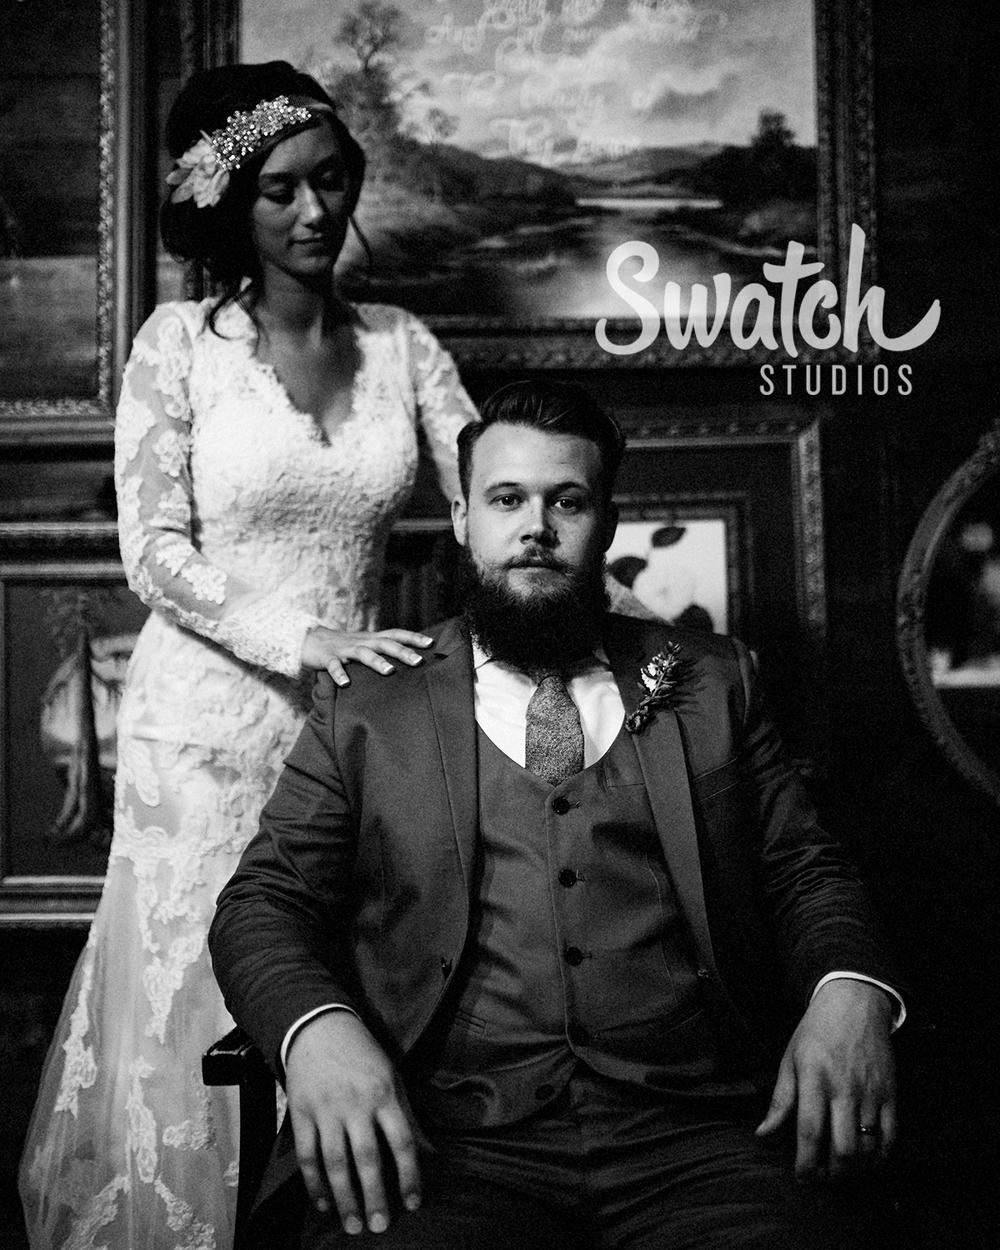 Bride_and_Groom_Vintage_Portrait